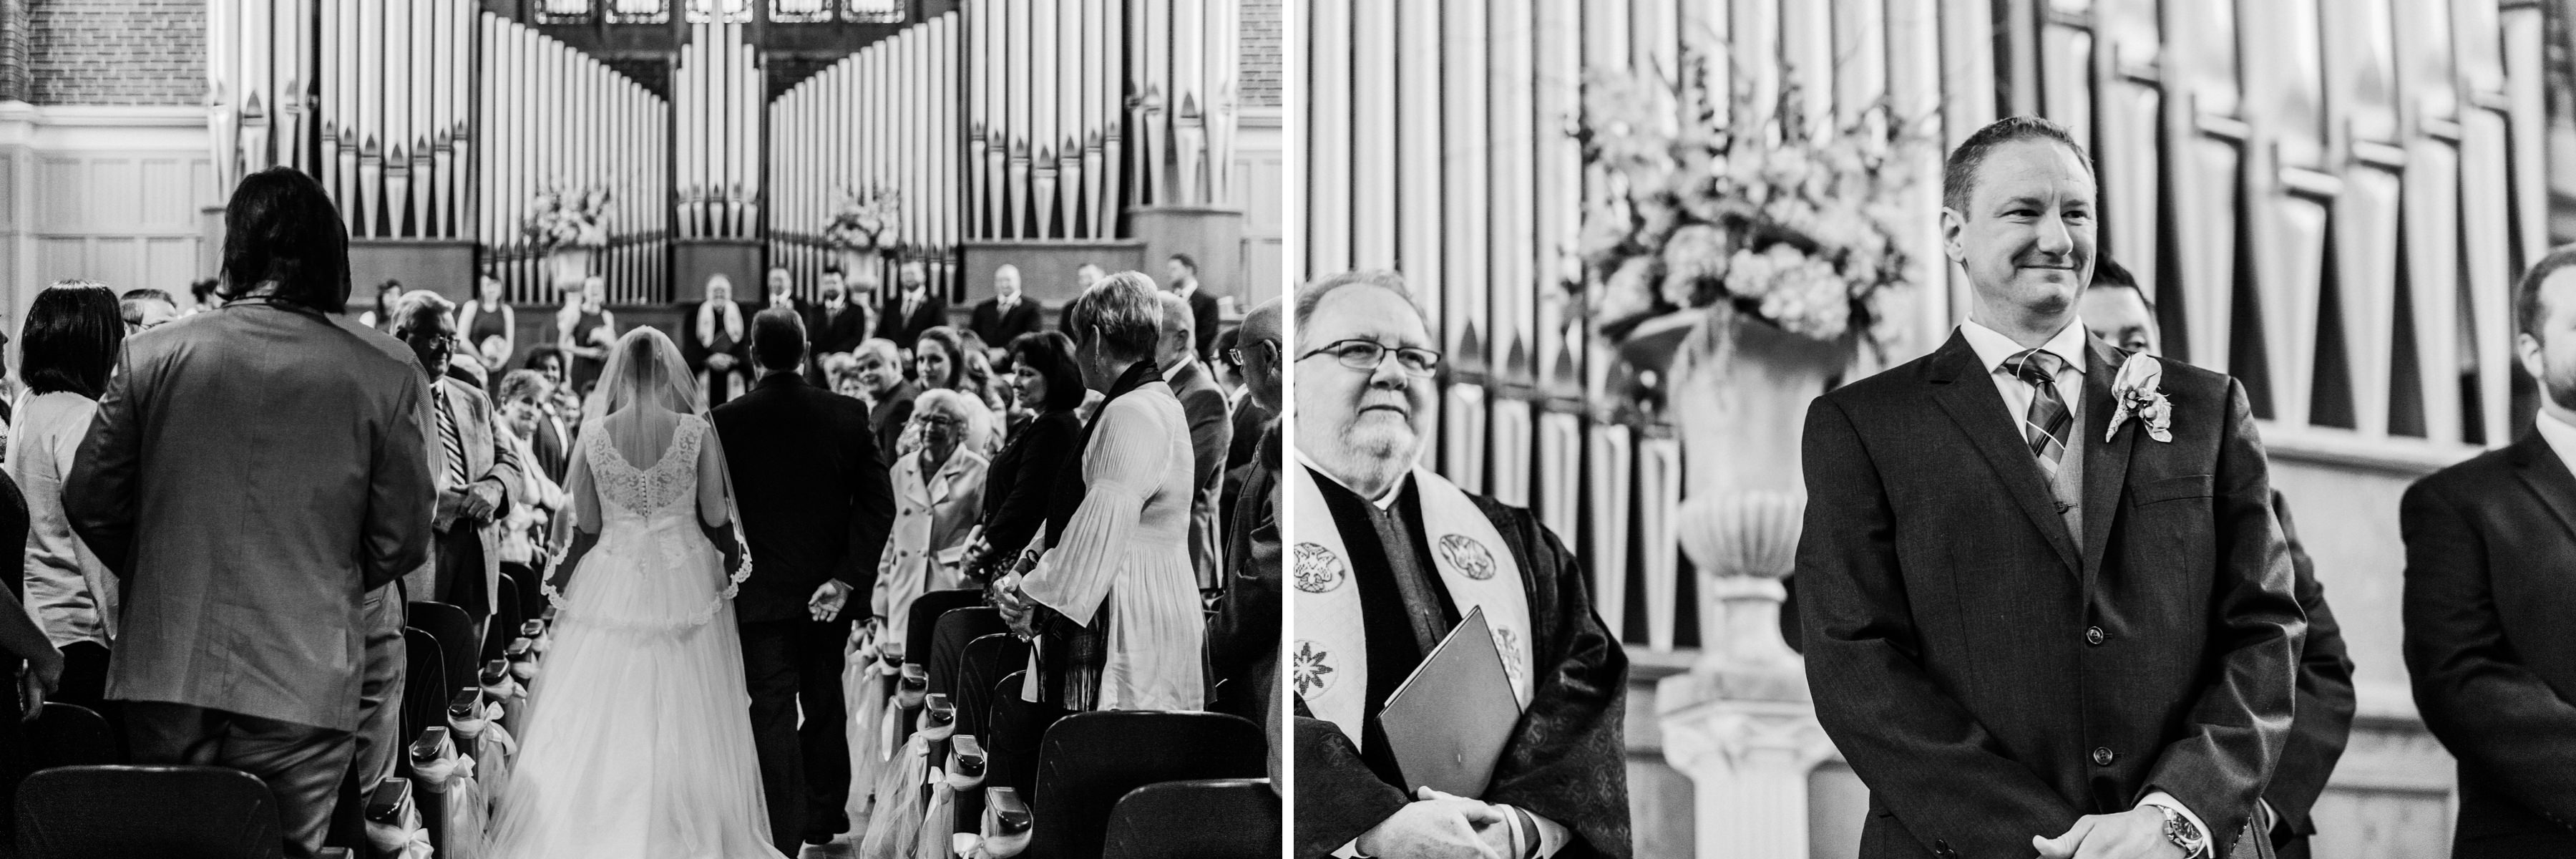 MAULDIN_WEDDING_MONTGOMERY_ALABAMA_WEDDING_PHOTOGRAPHY_59